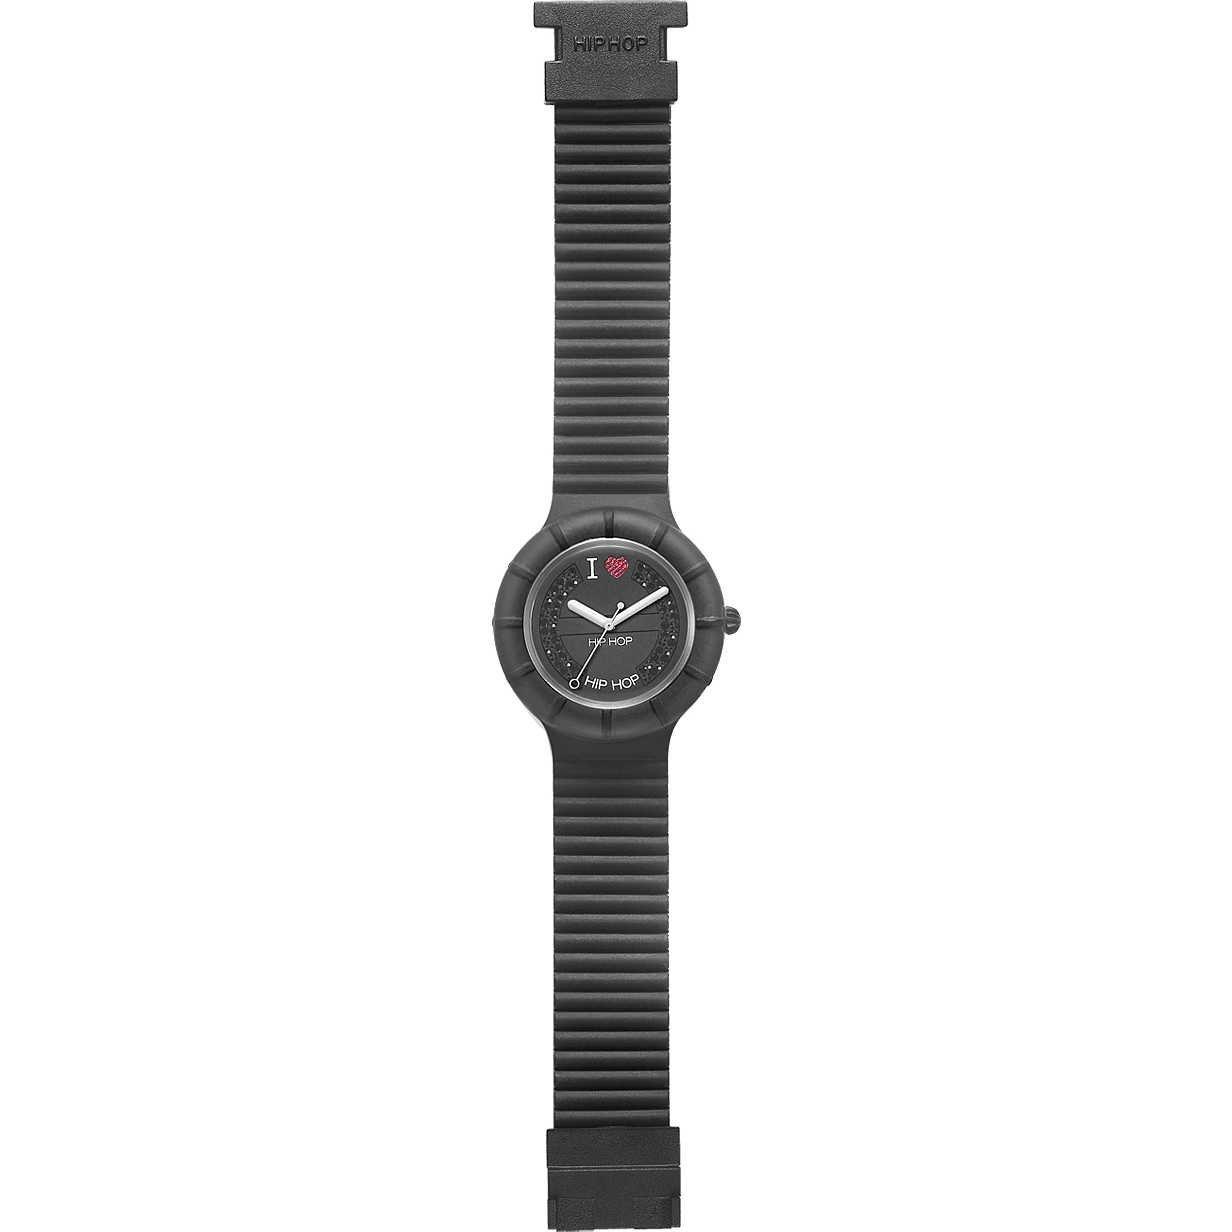 Amazon.com: ORIGINAL BREIL HIP HOP WATCH 35MM CRYSTALS BLACK HWU0082: Watches